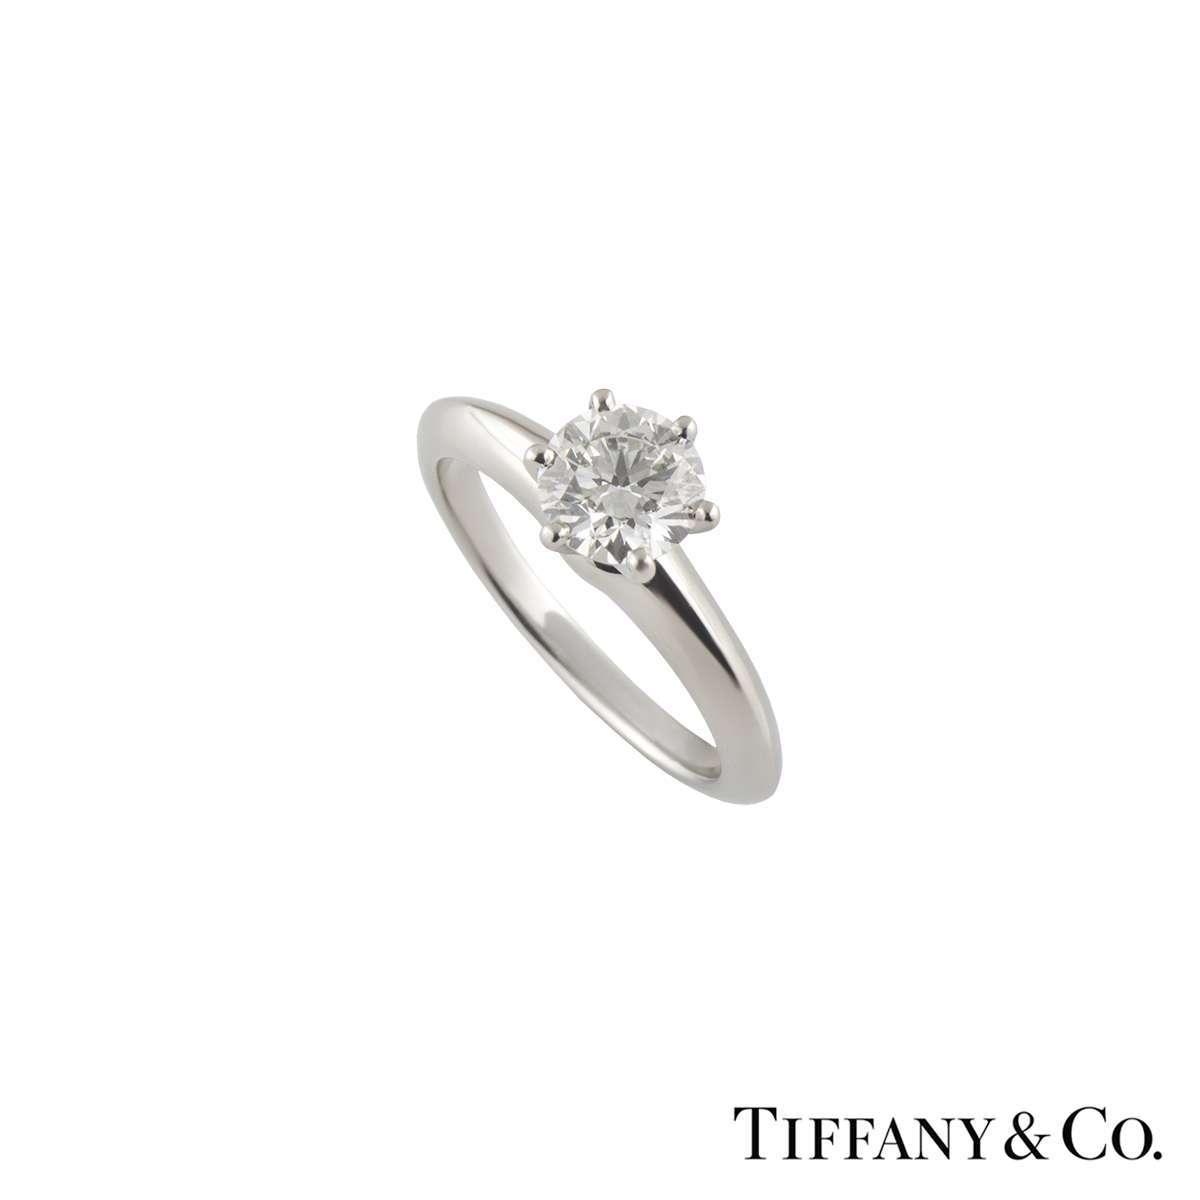 Tiffany & Co. Diamond Setting Band Platinum Ring 1.08ct H/VS1 XXX